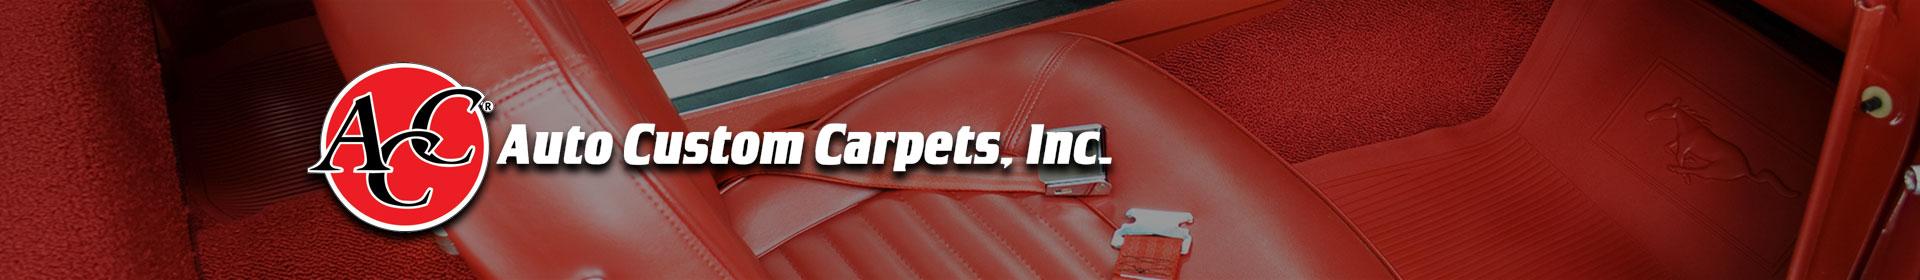 ACC Carpet